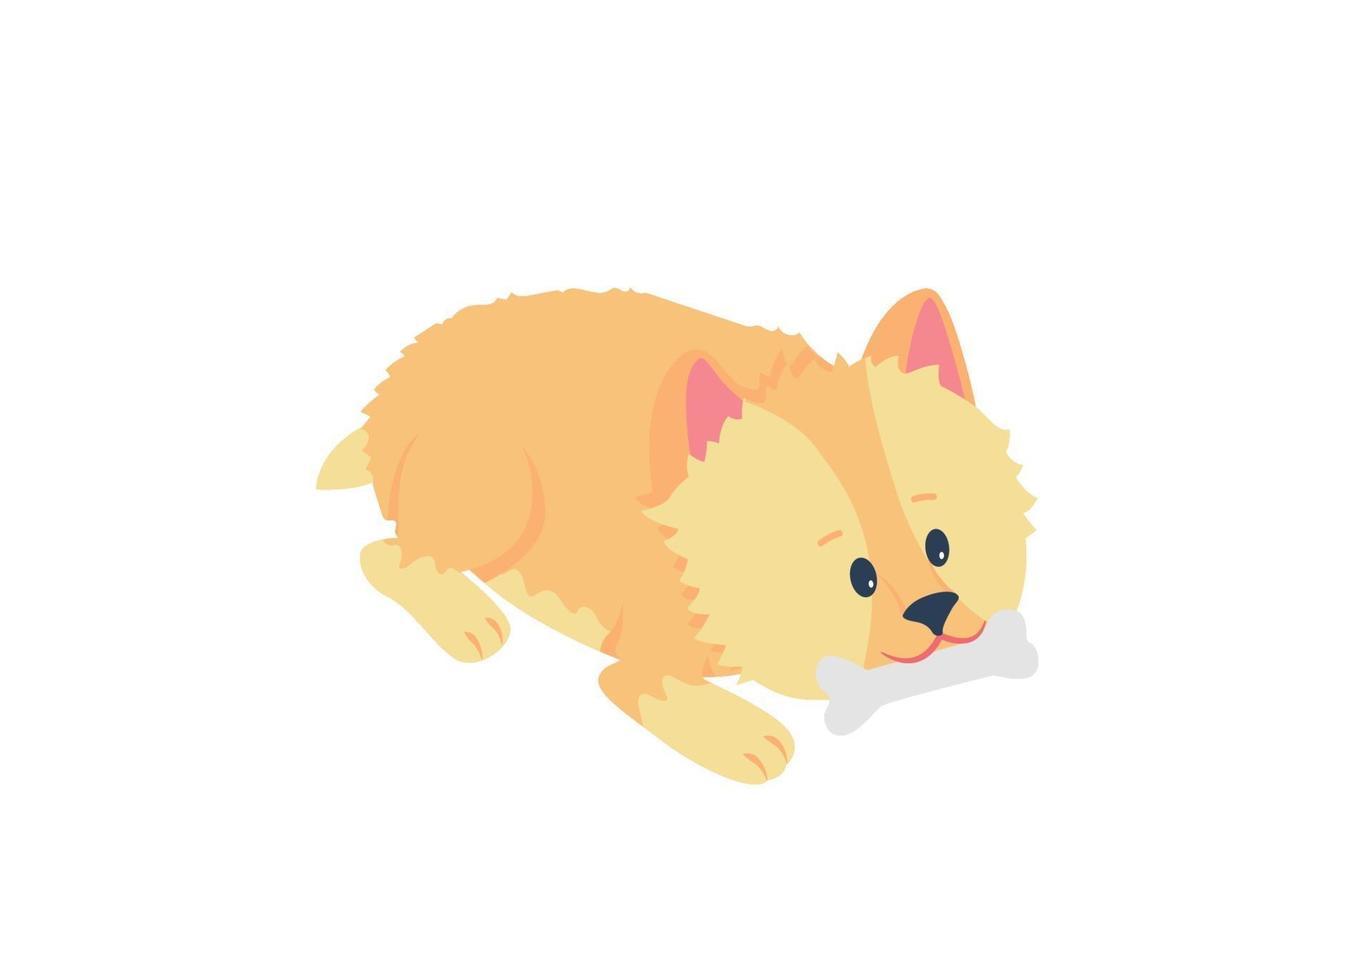 Terrier Welpen kauen Knochen flache Farbe Vektor detaillierte Charakter